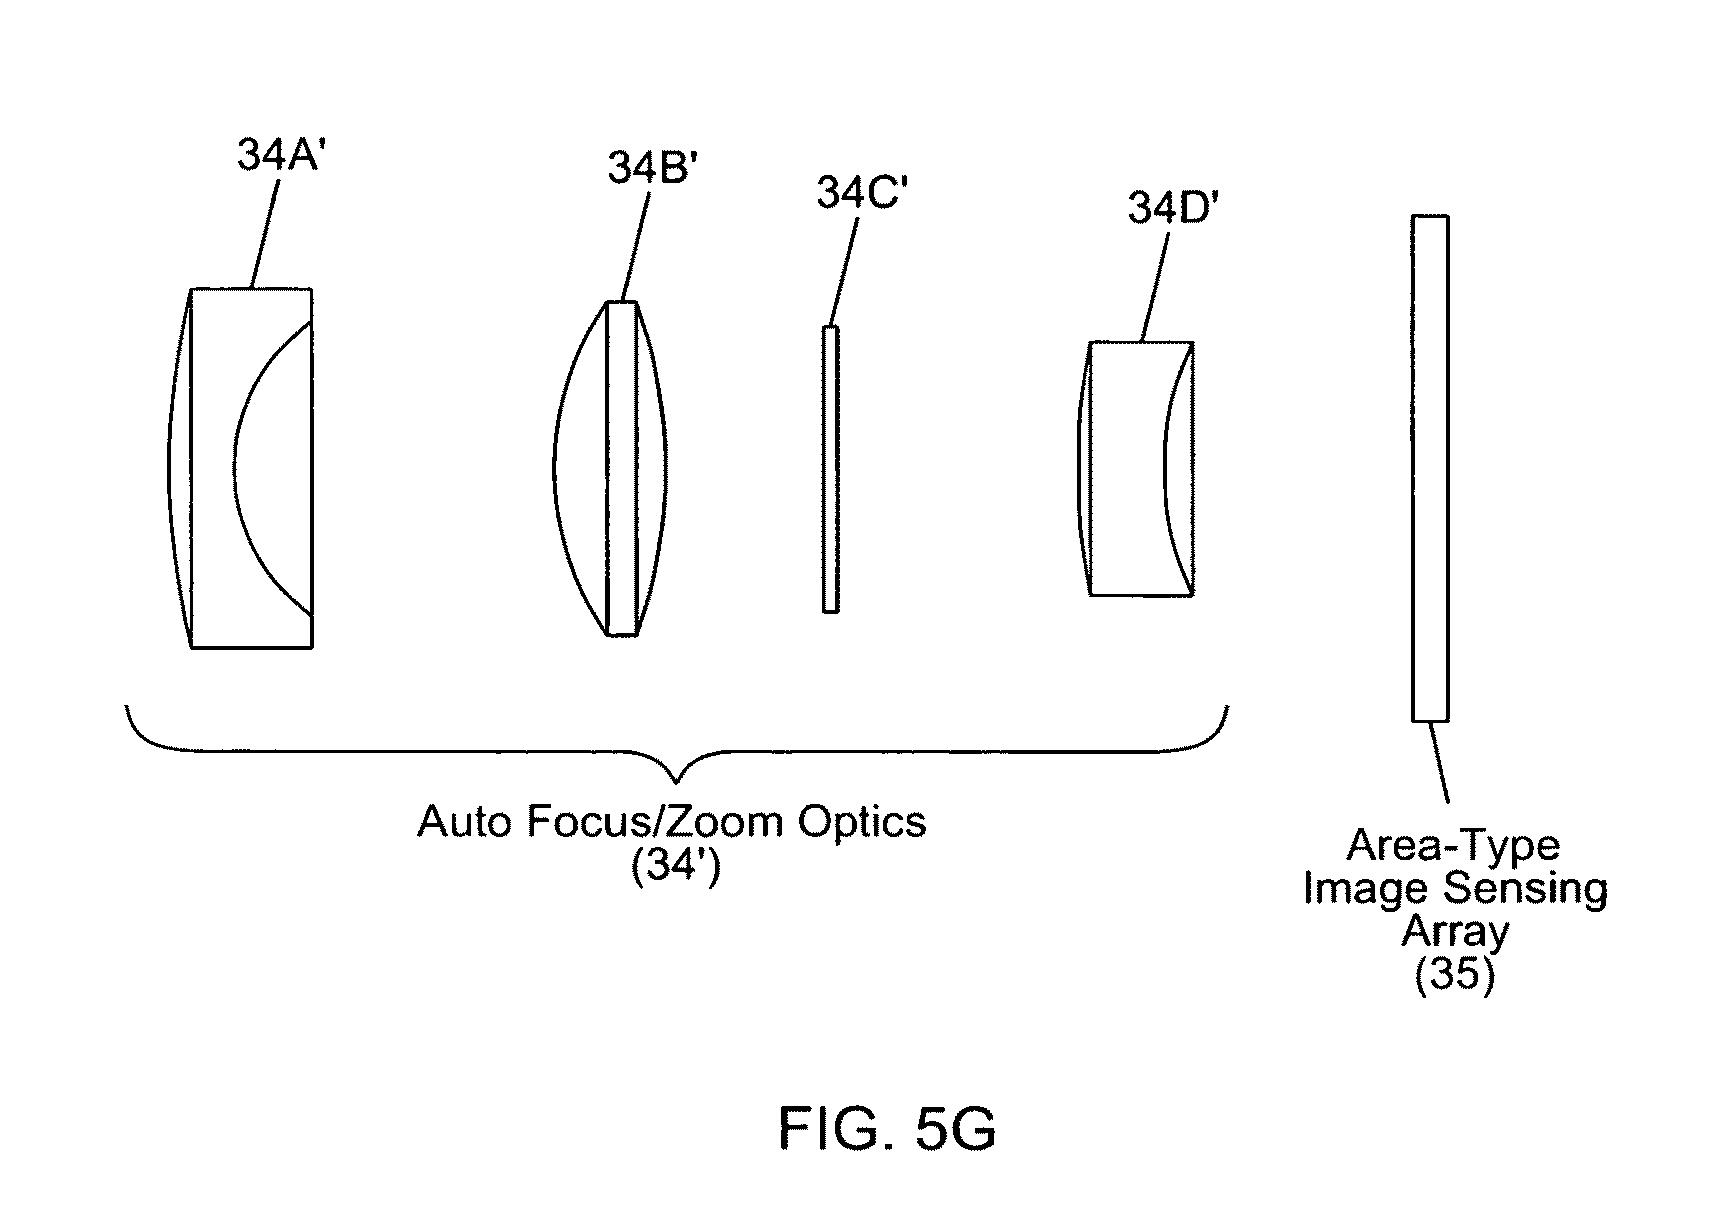 Patent US 7,967,209 B2